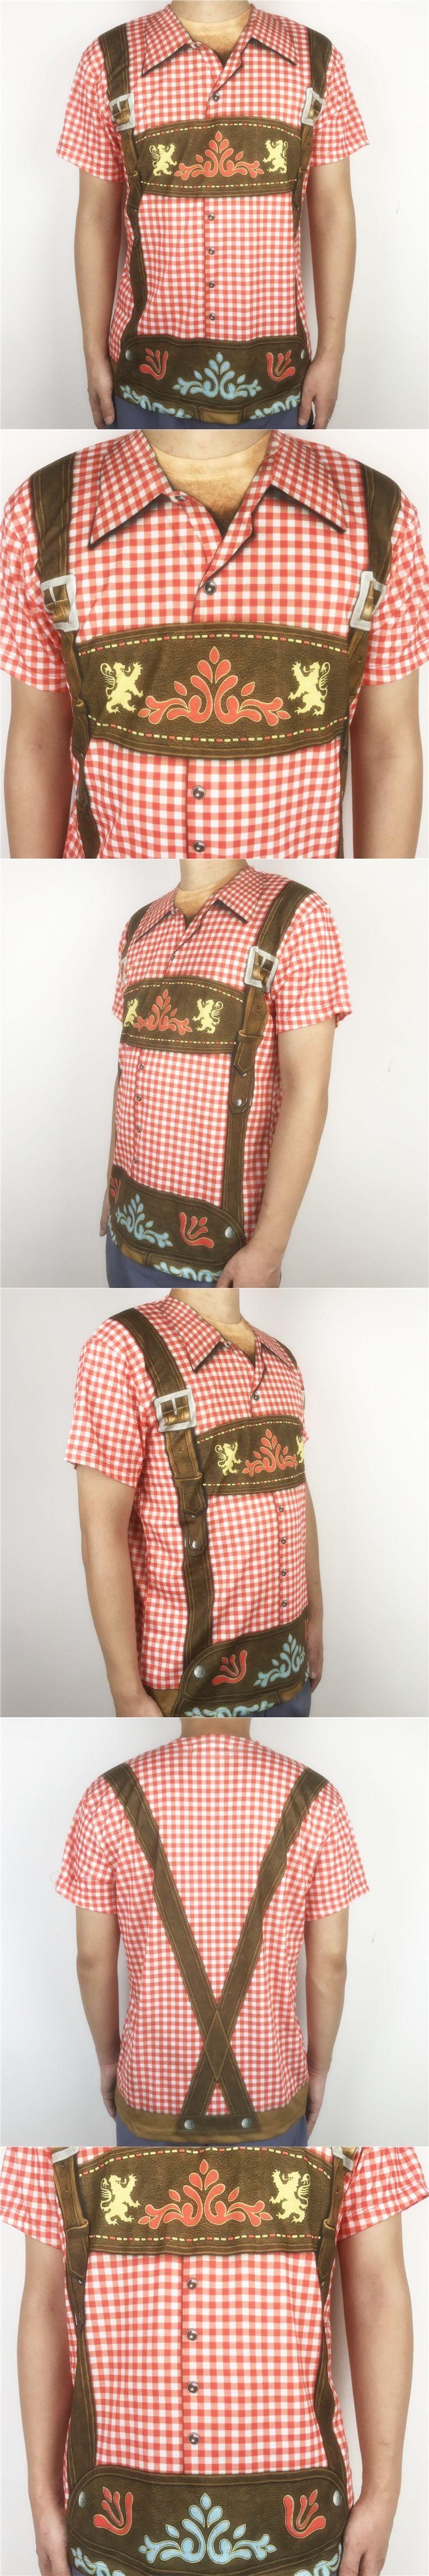 Funny Oktoberfest Lederhosen Printed T Shirts for Men Vintage Short Sleeve Beer Festival Party Costume Tee Plus Size S-XL